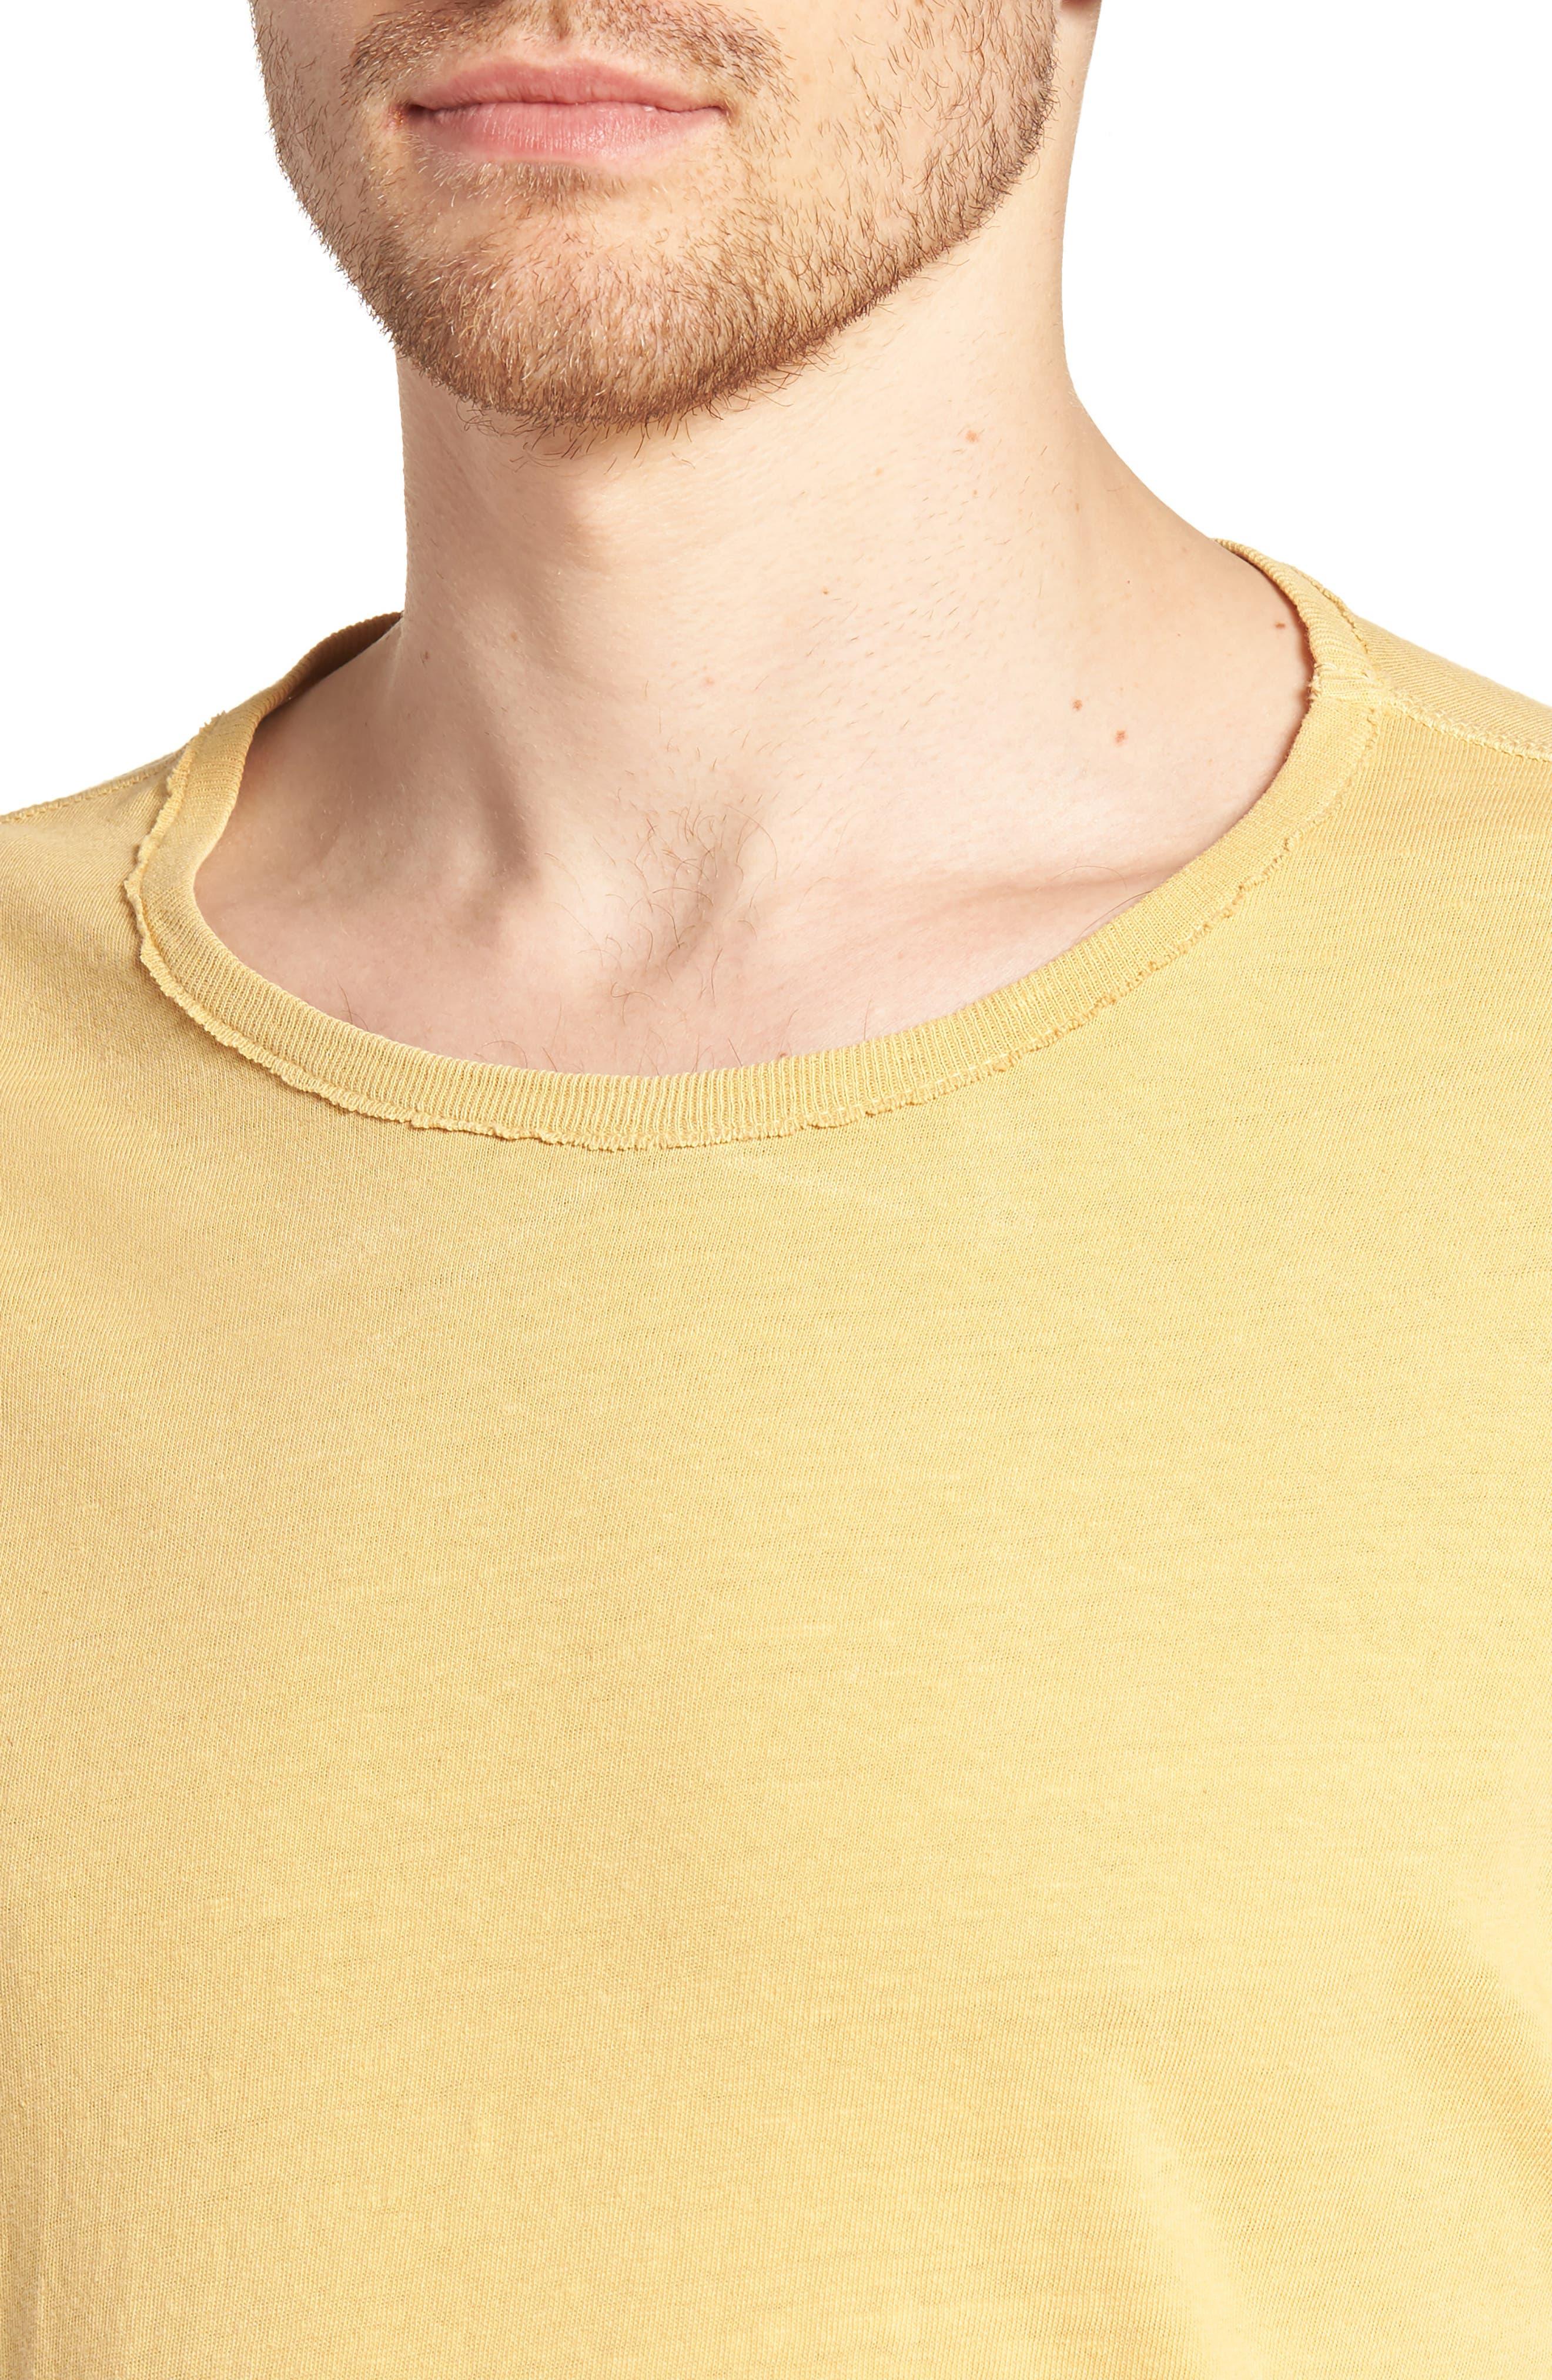 Ramsey Slim Fit Crewneck T-Shirt,                             Alternate thumbnail 4, color,                             Weathered Golden Emmer